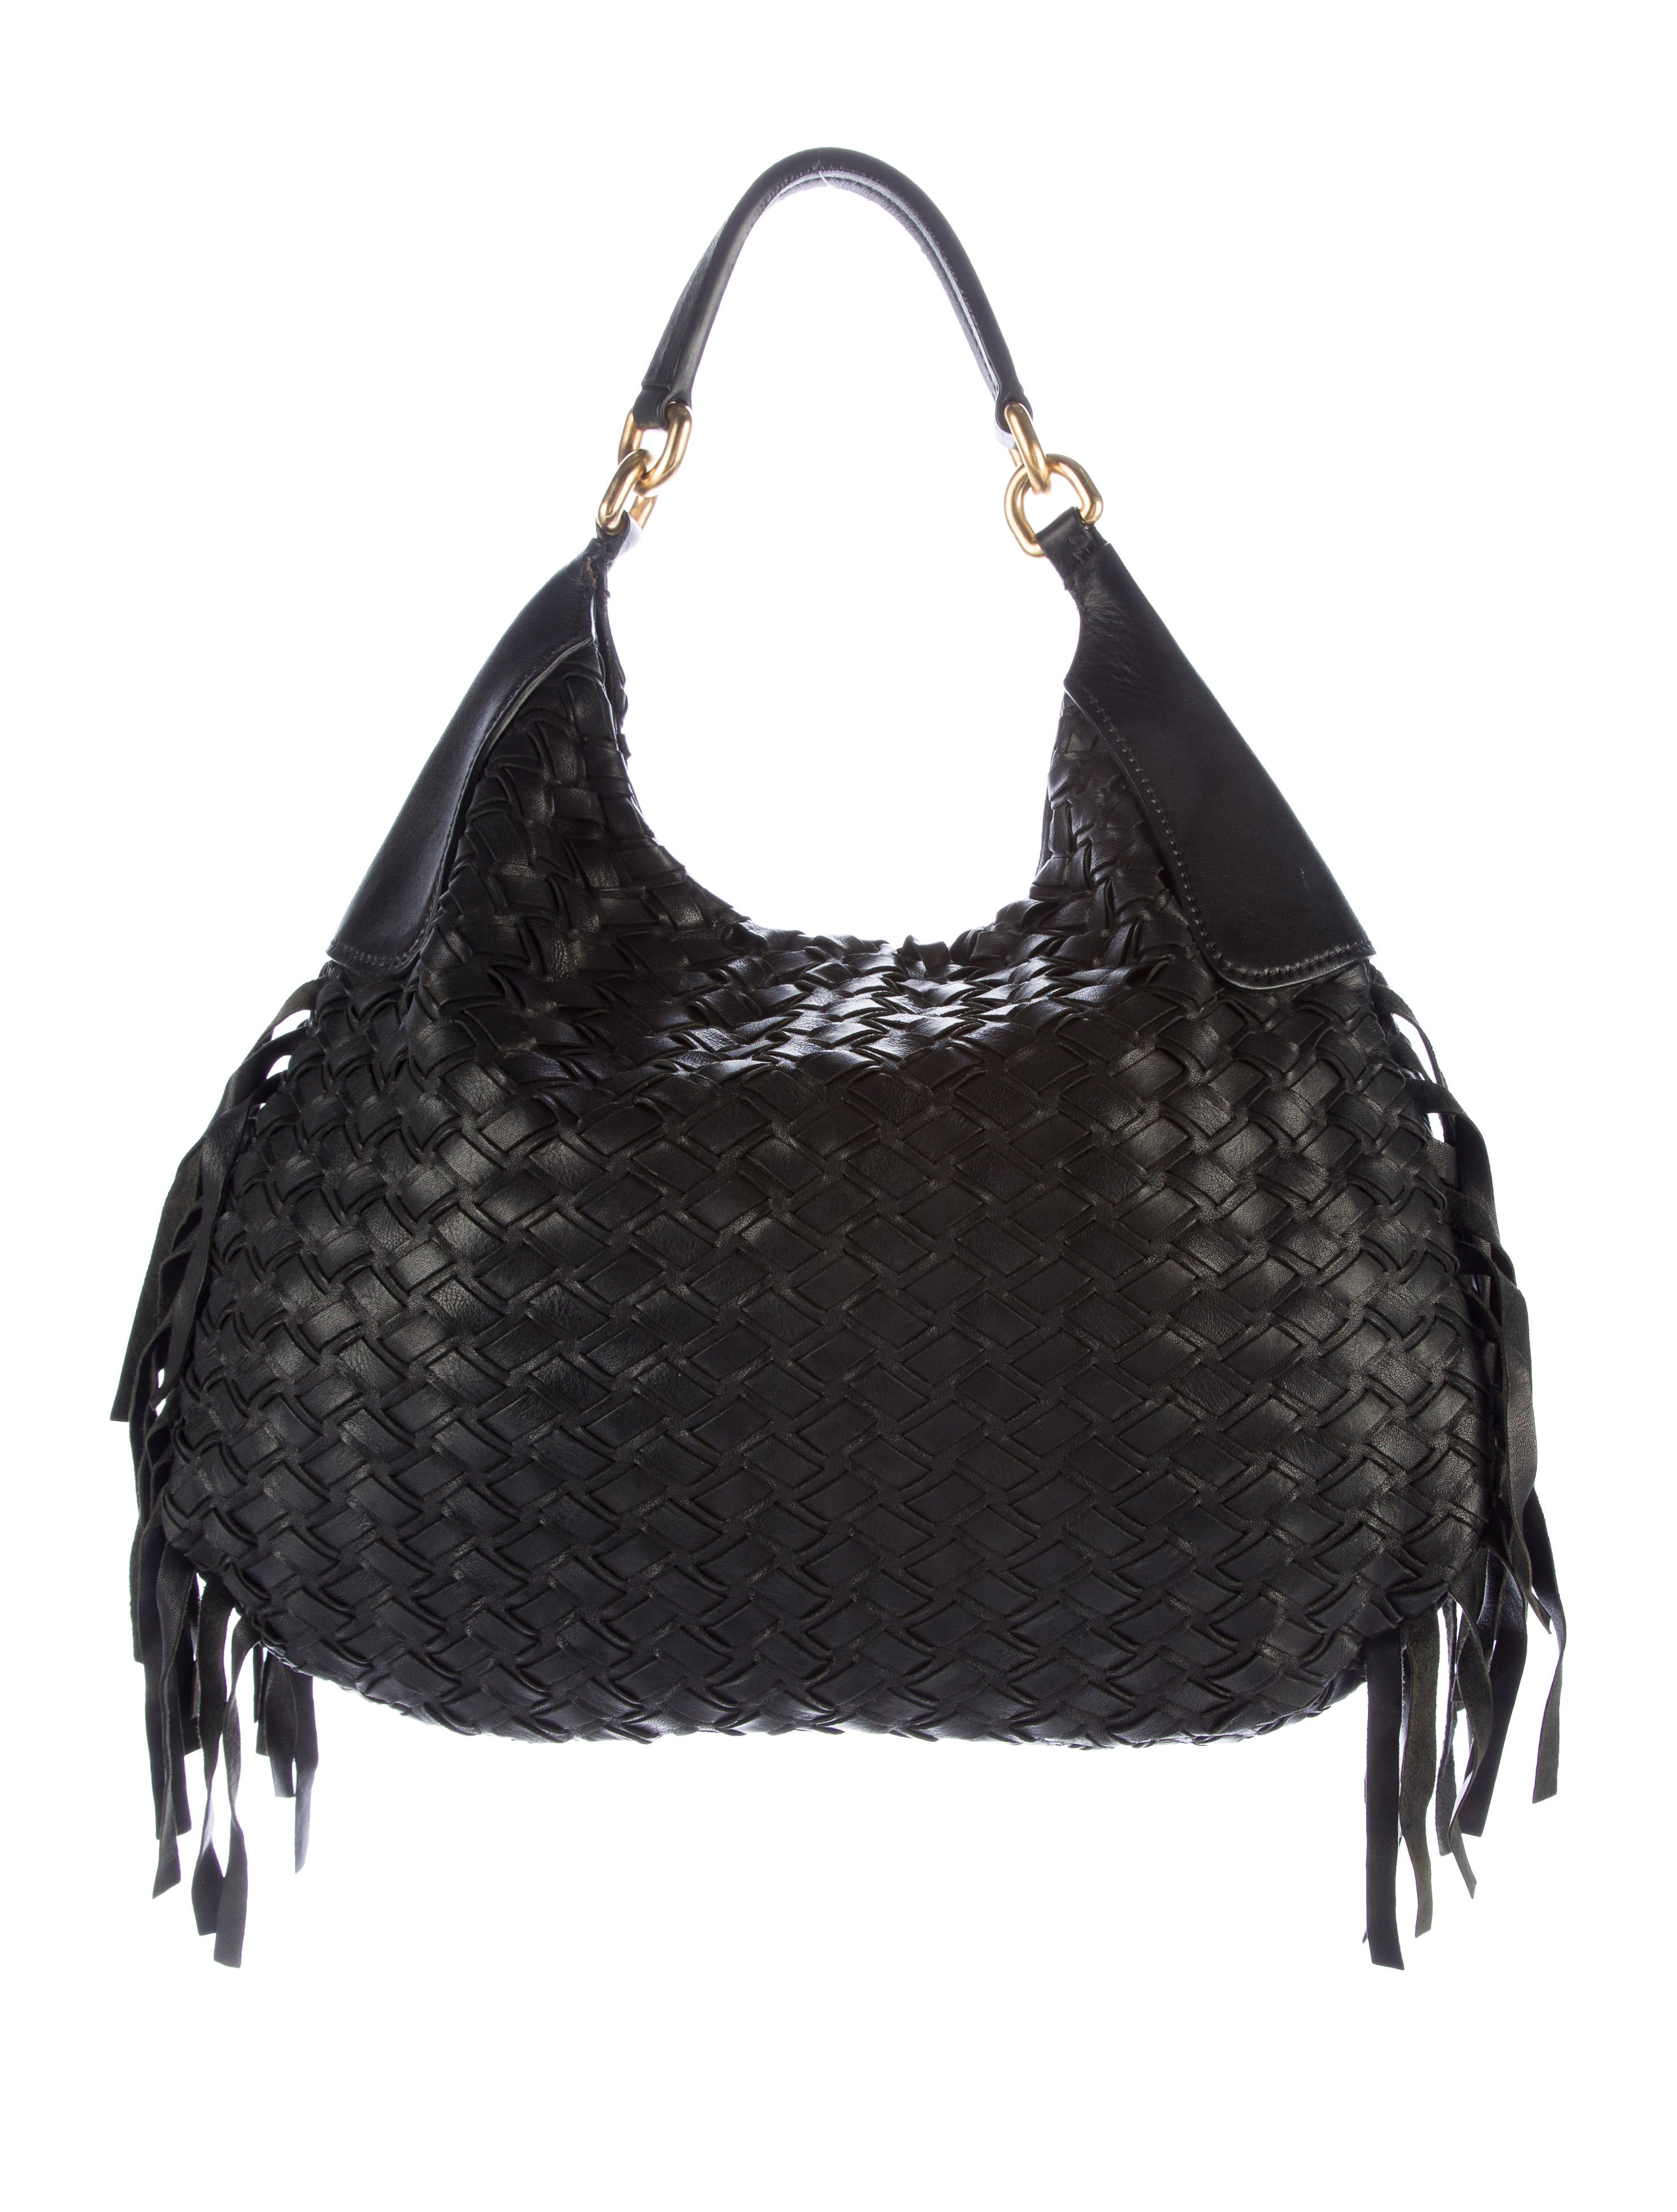 Miu Miu Leather Fringe Hobo Bag